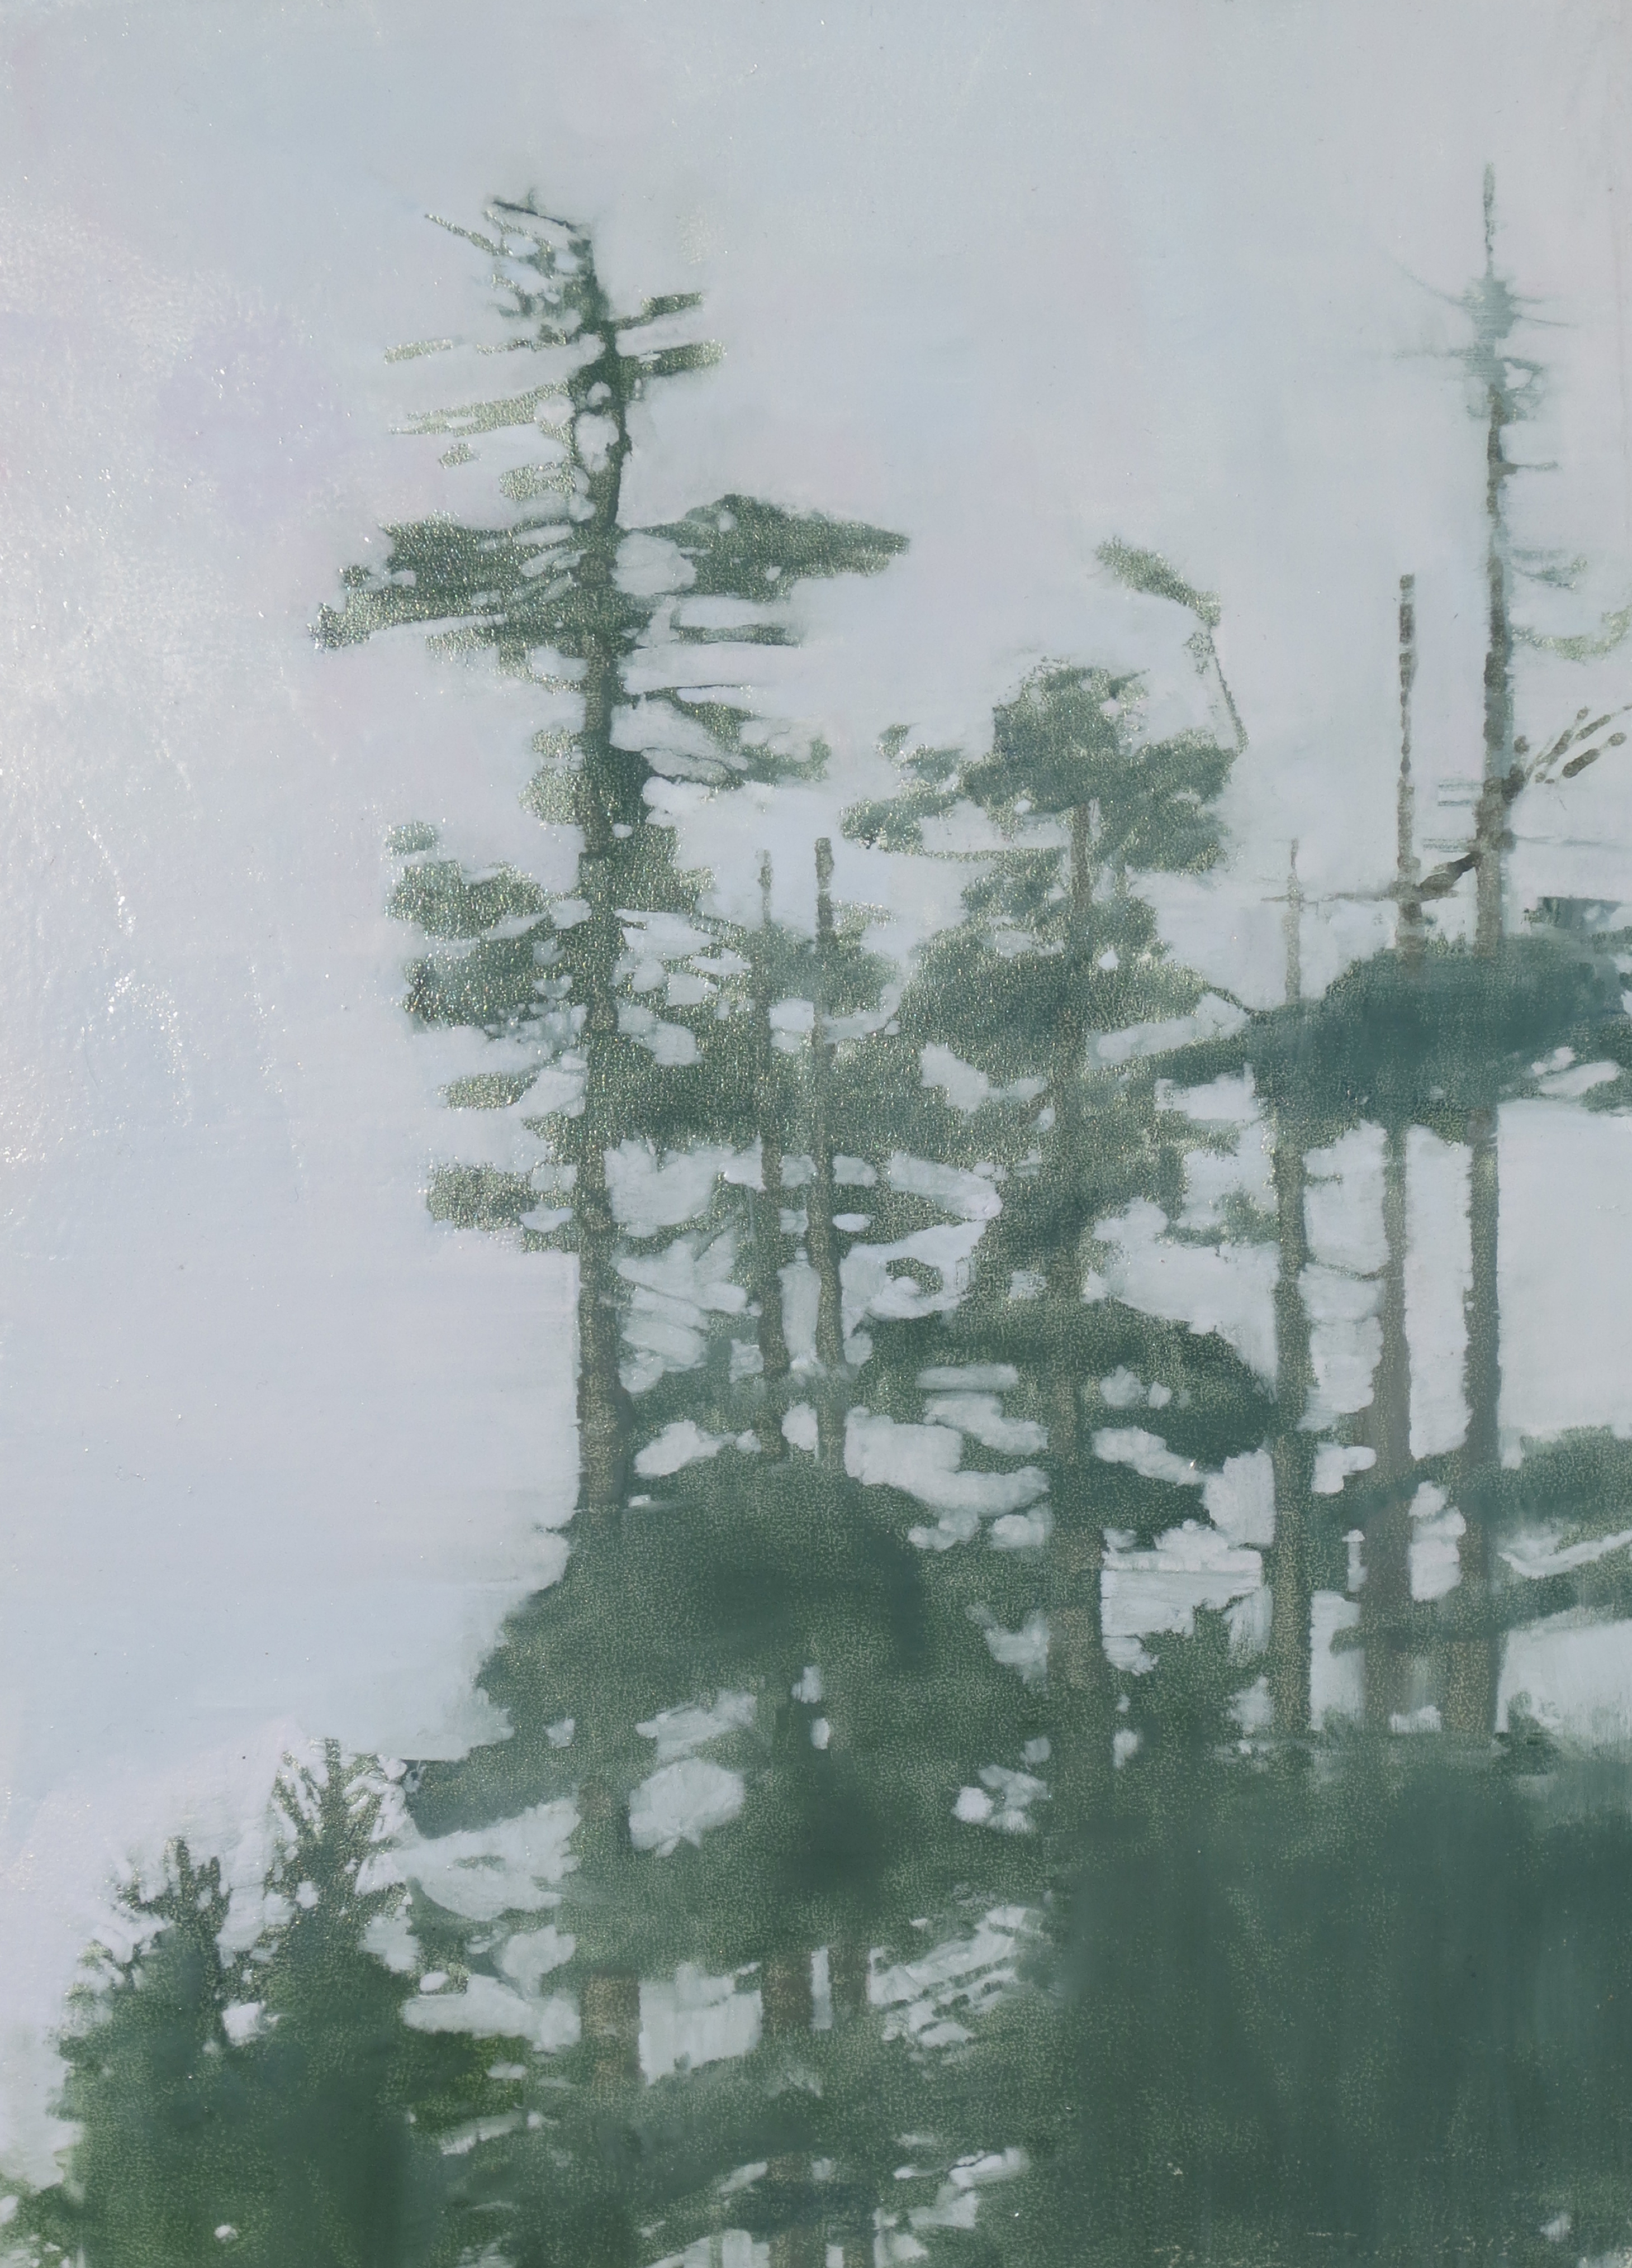 Treetops in Fog